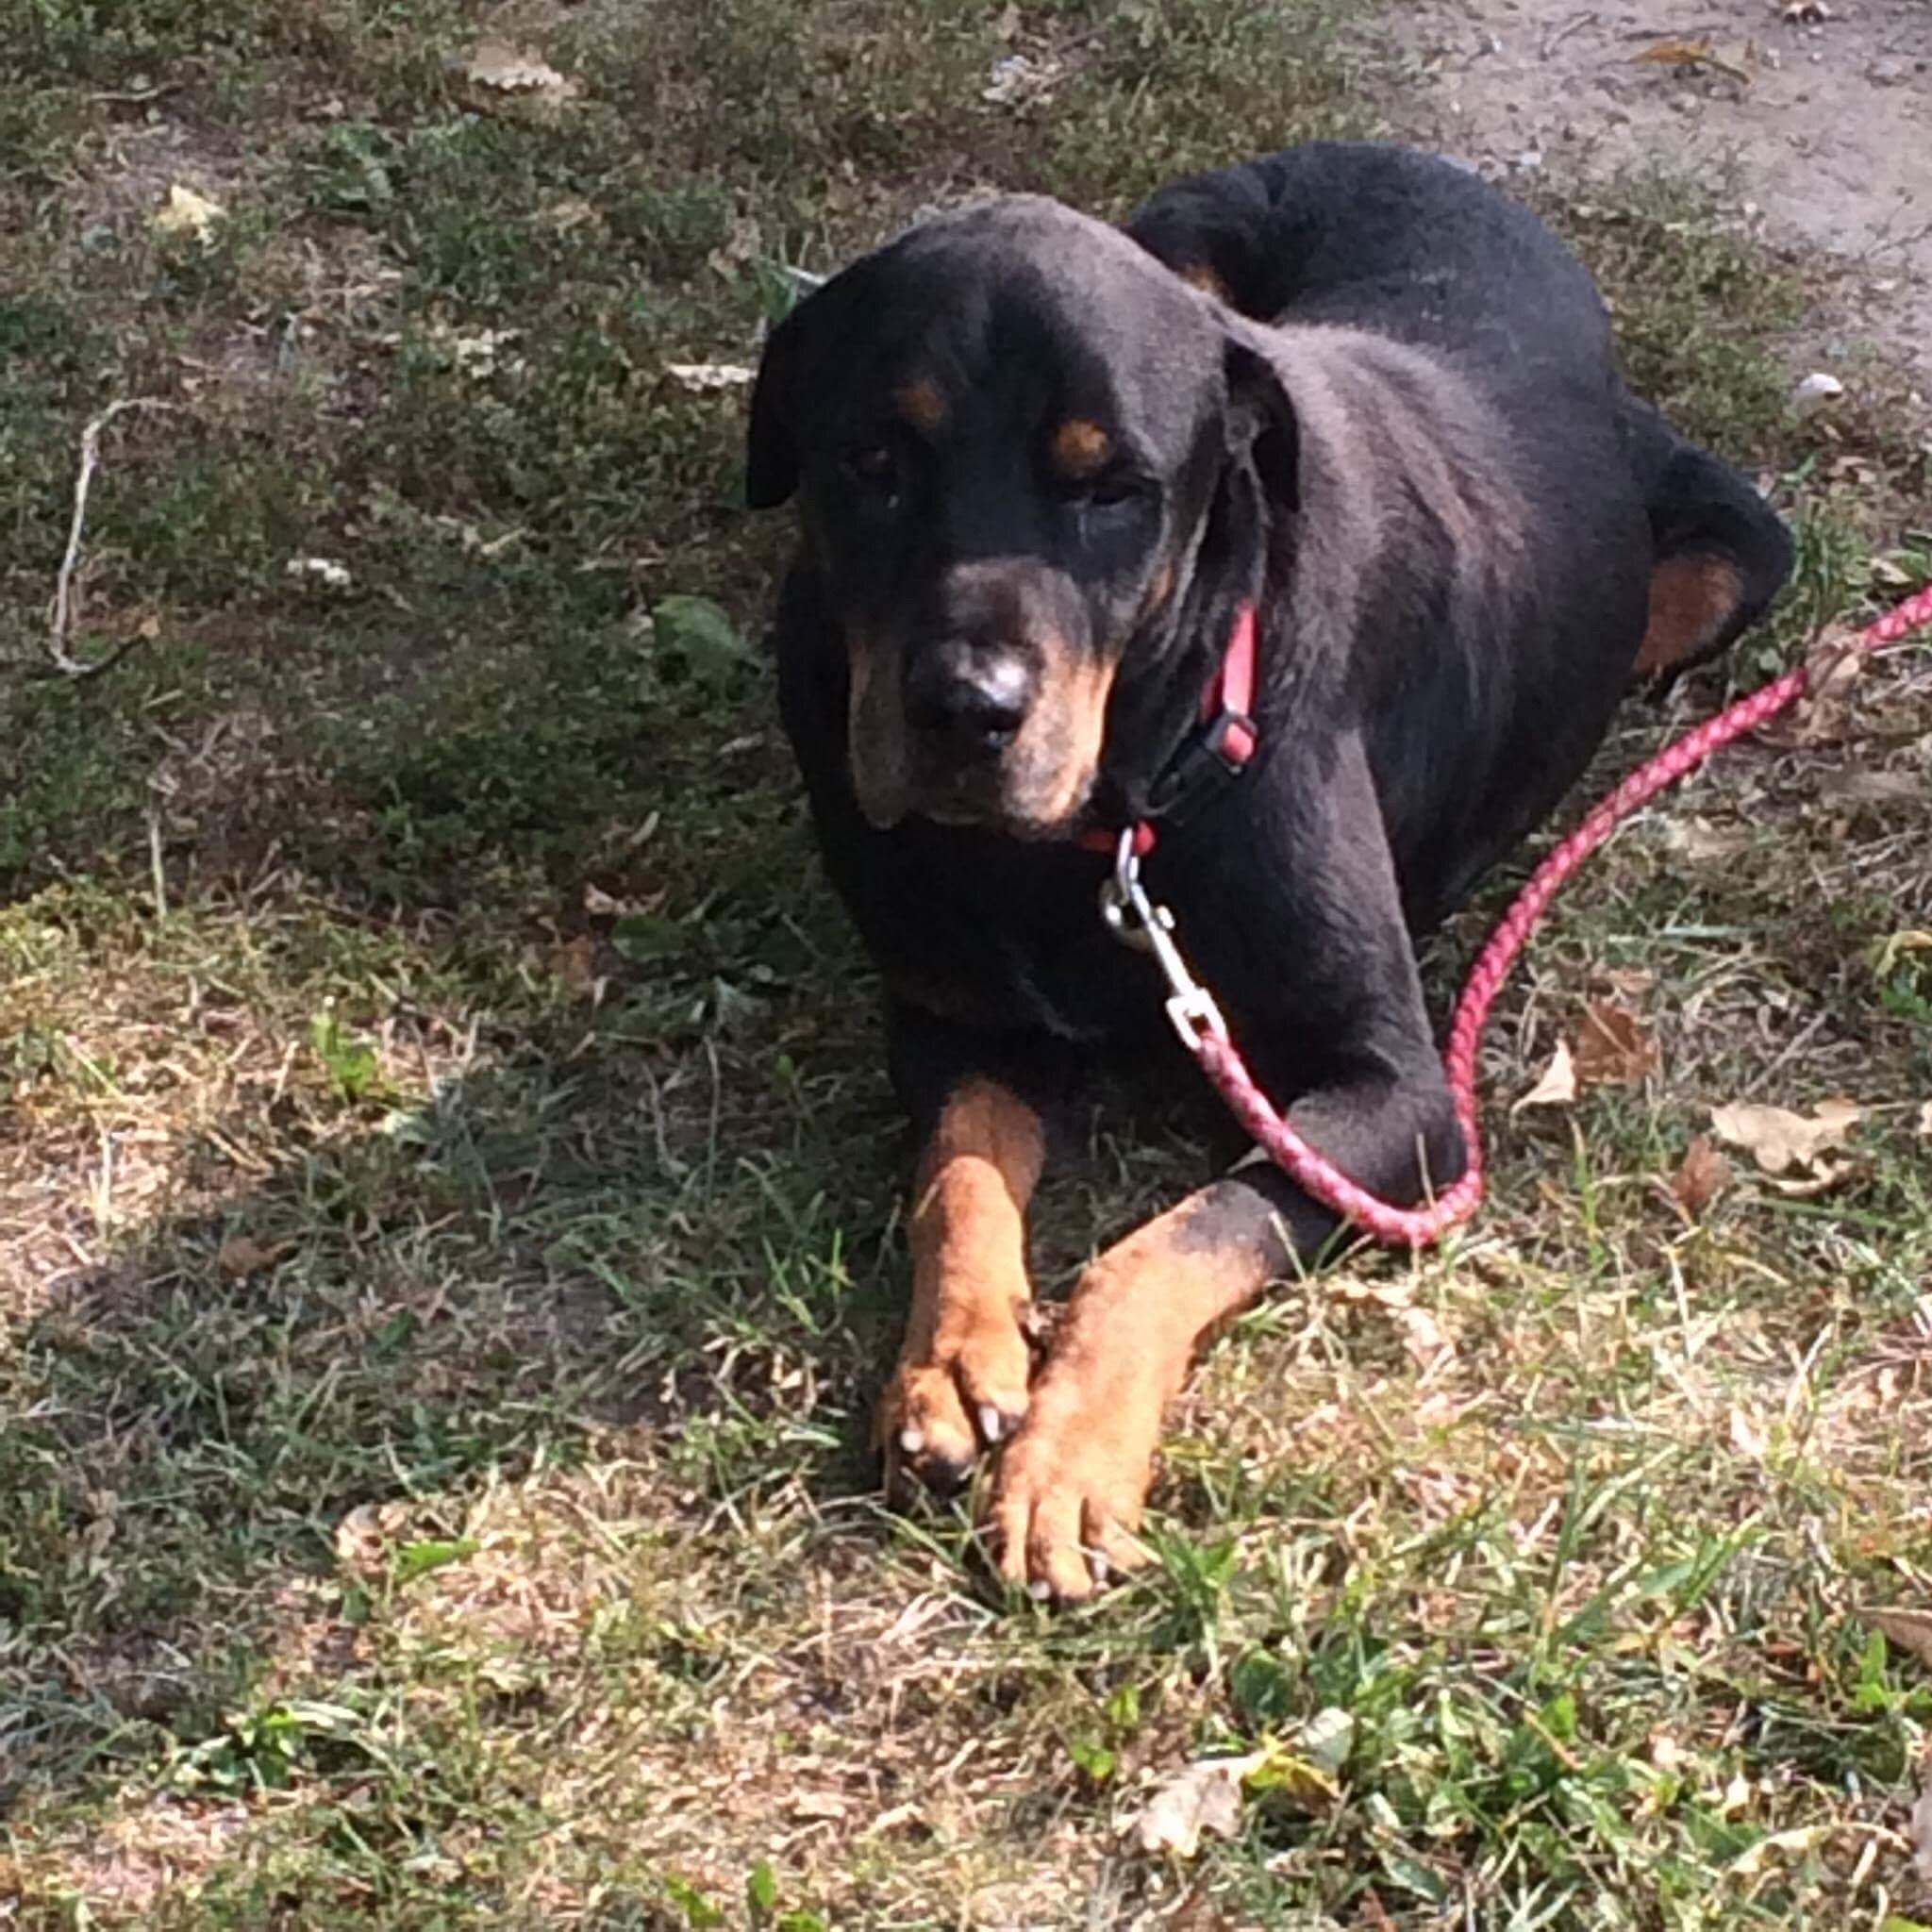 Rottweiler dog for Adoption in Portland, IN. ADN673494 on